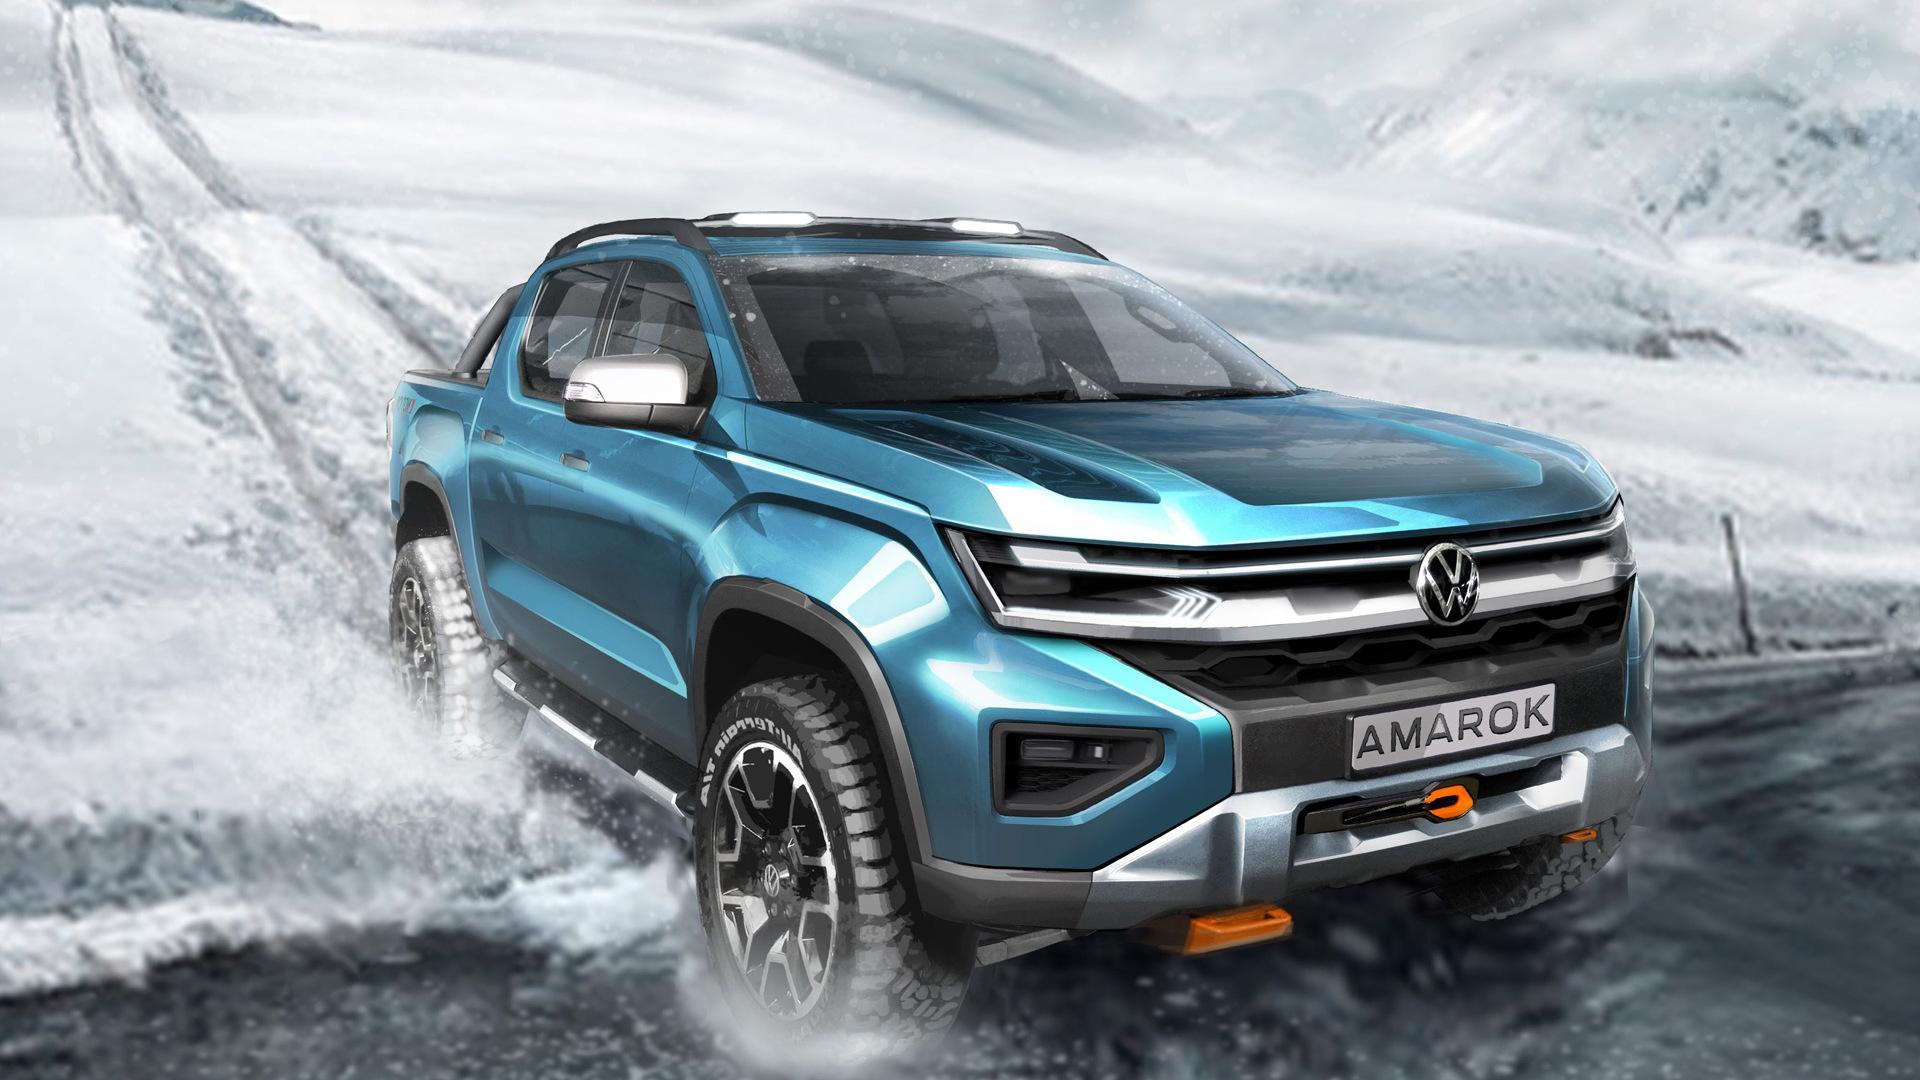 Teaser for 2022 Volkswagen Amarok